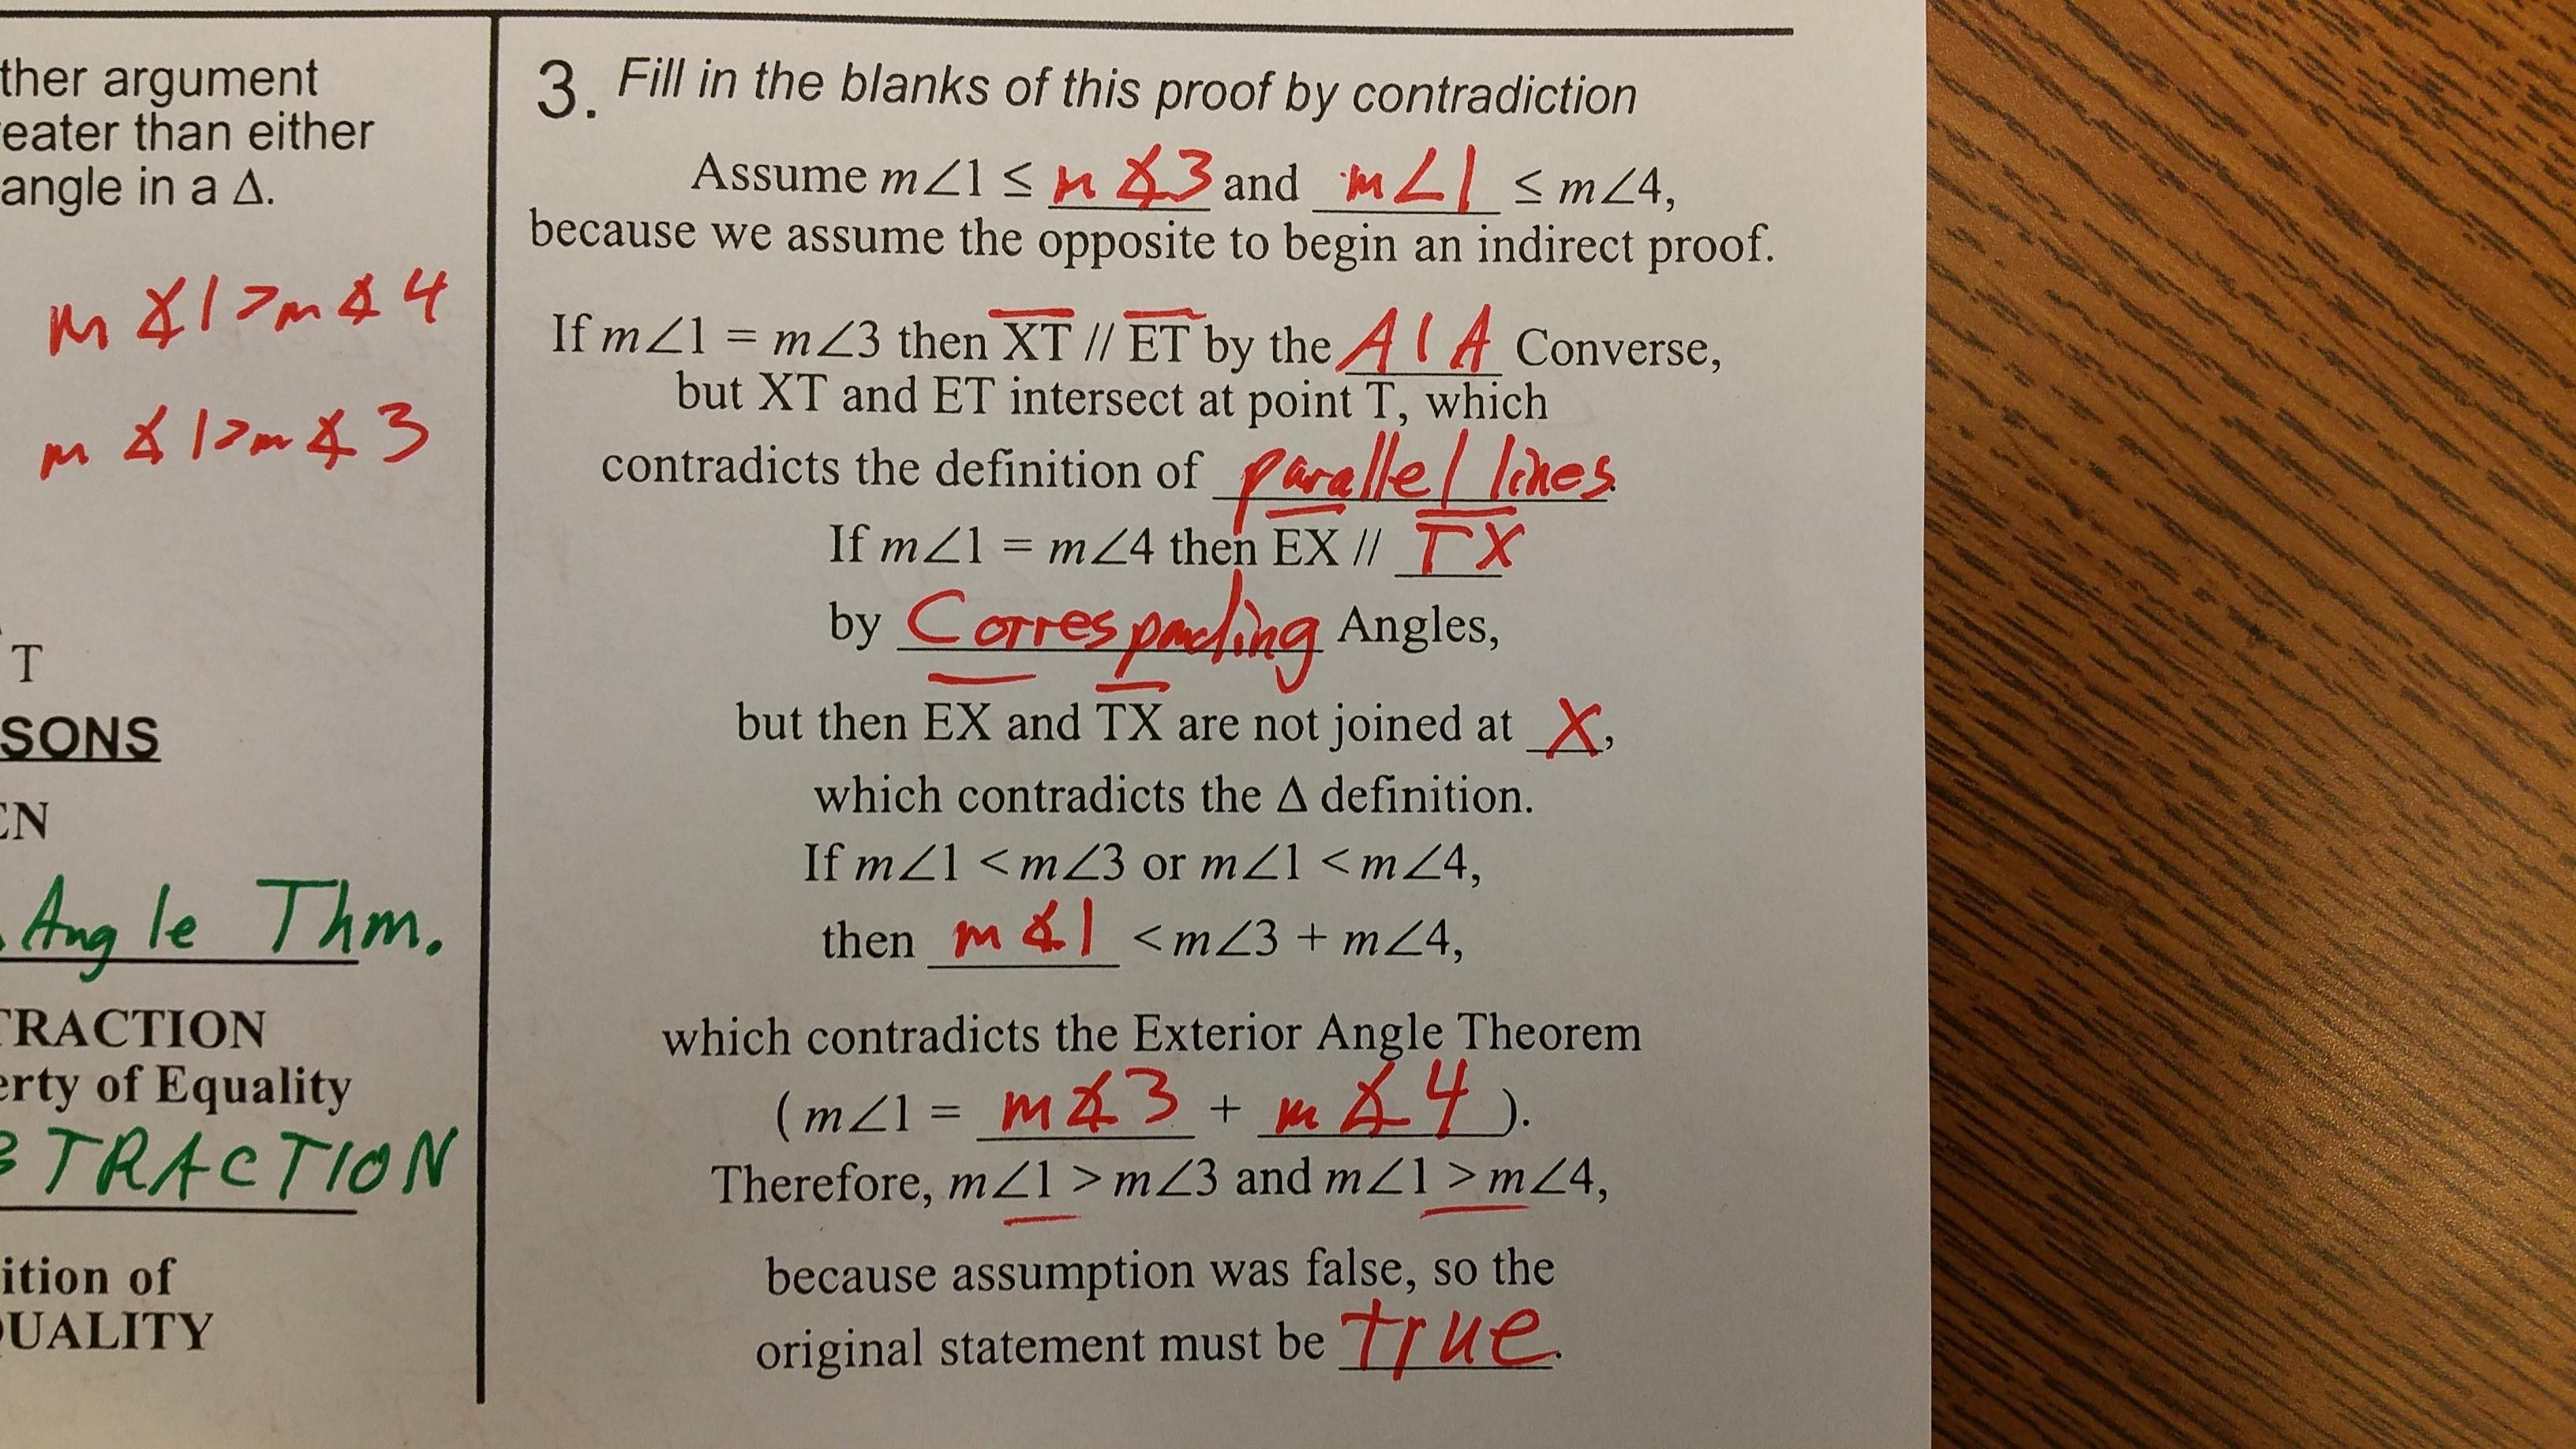 Gebhard Curt gdownloads – Indirect Proof Worksheet